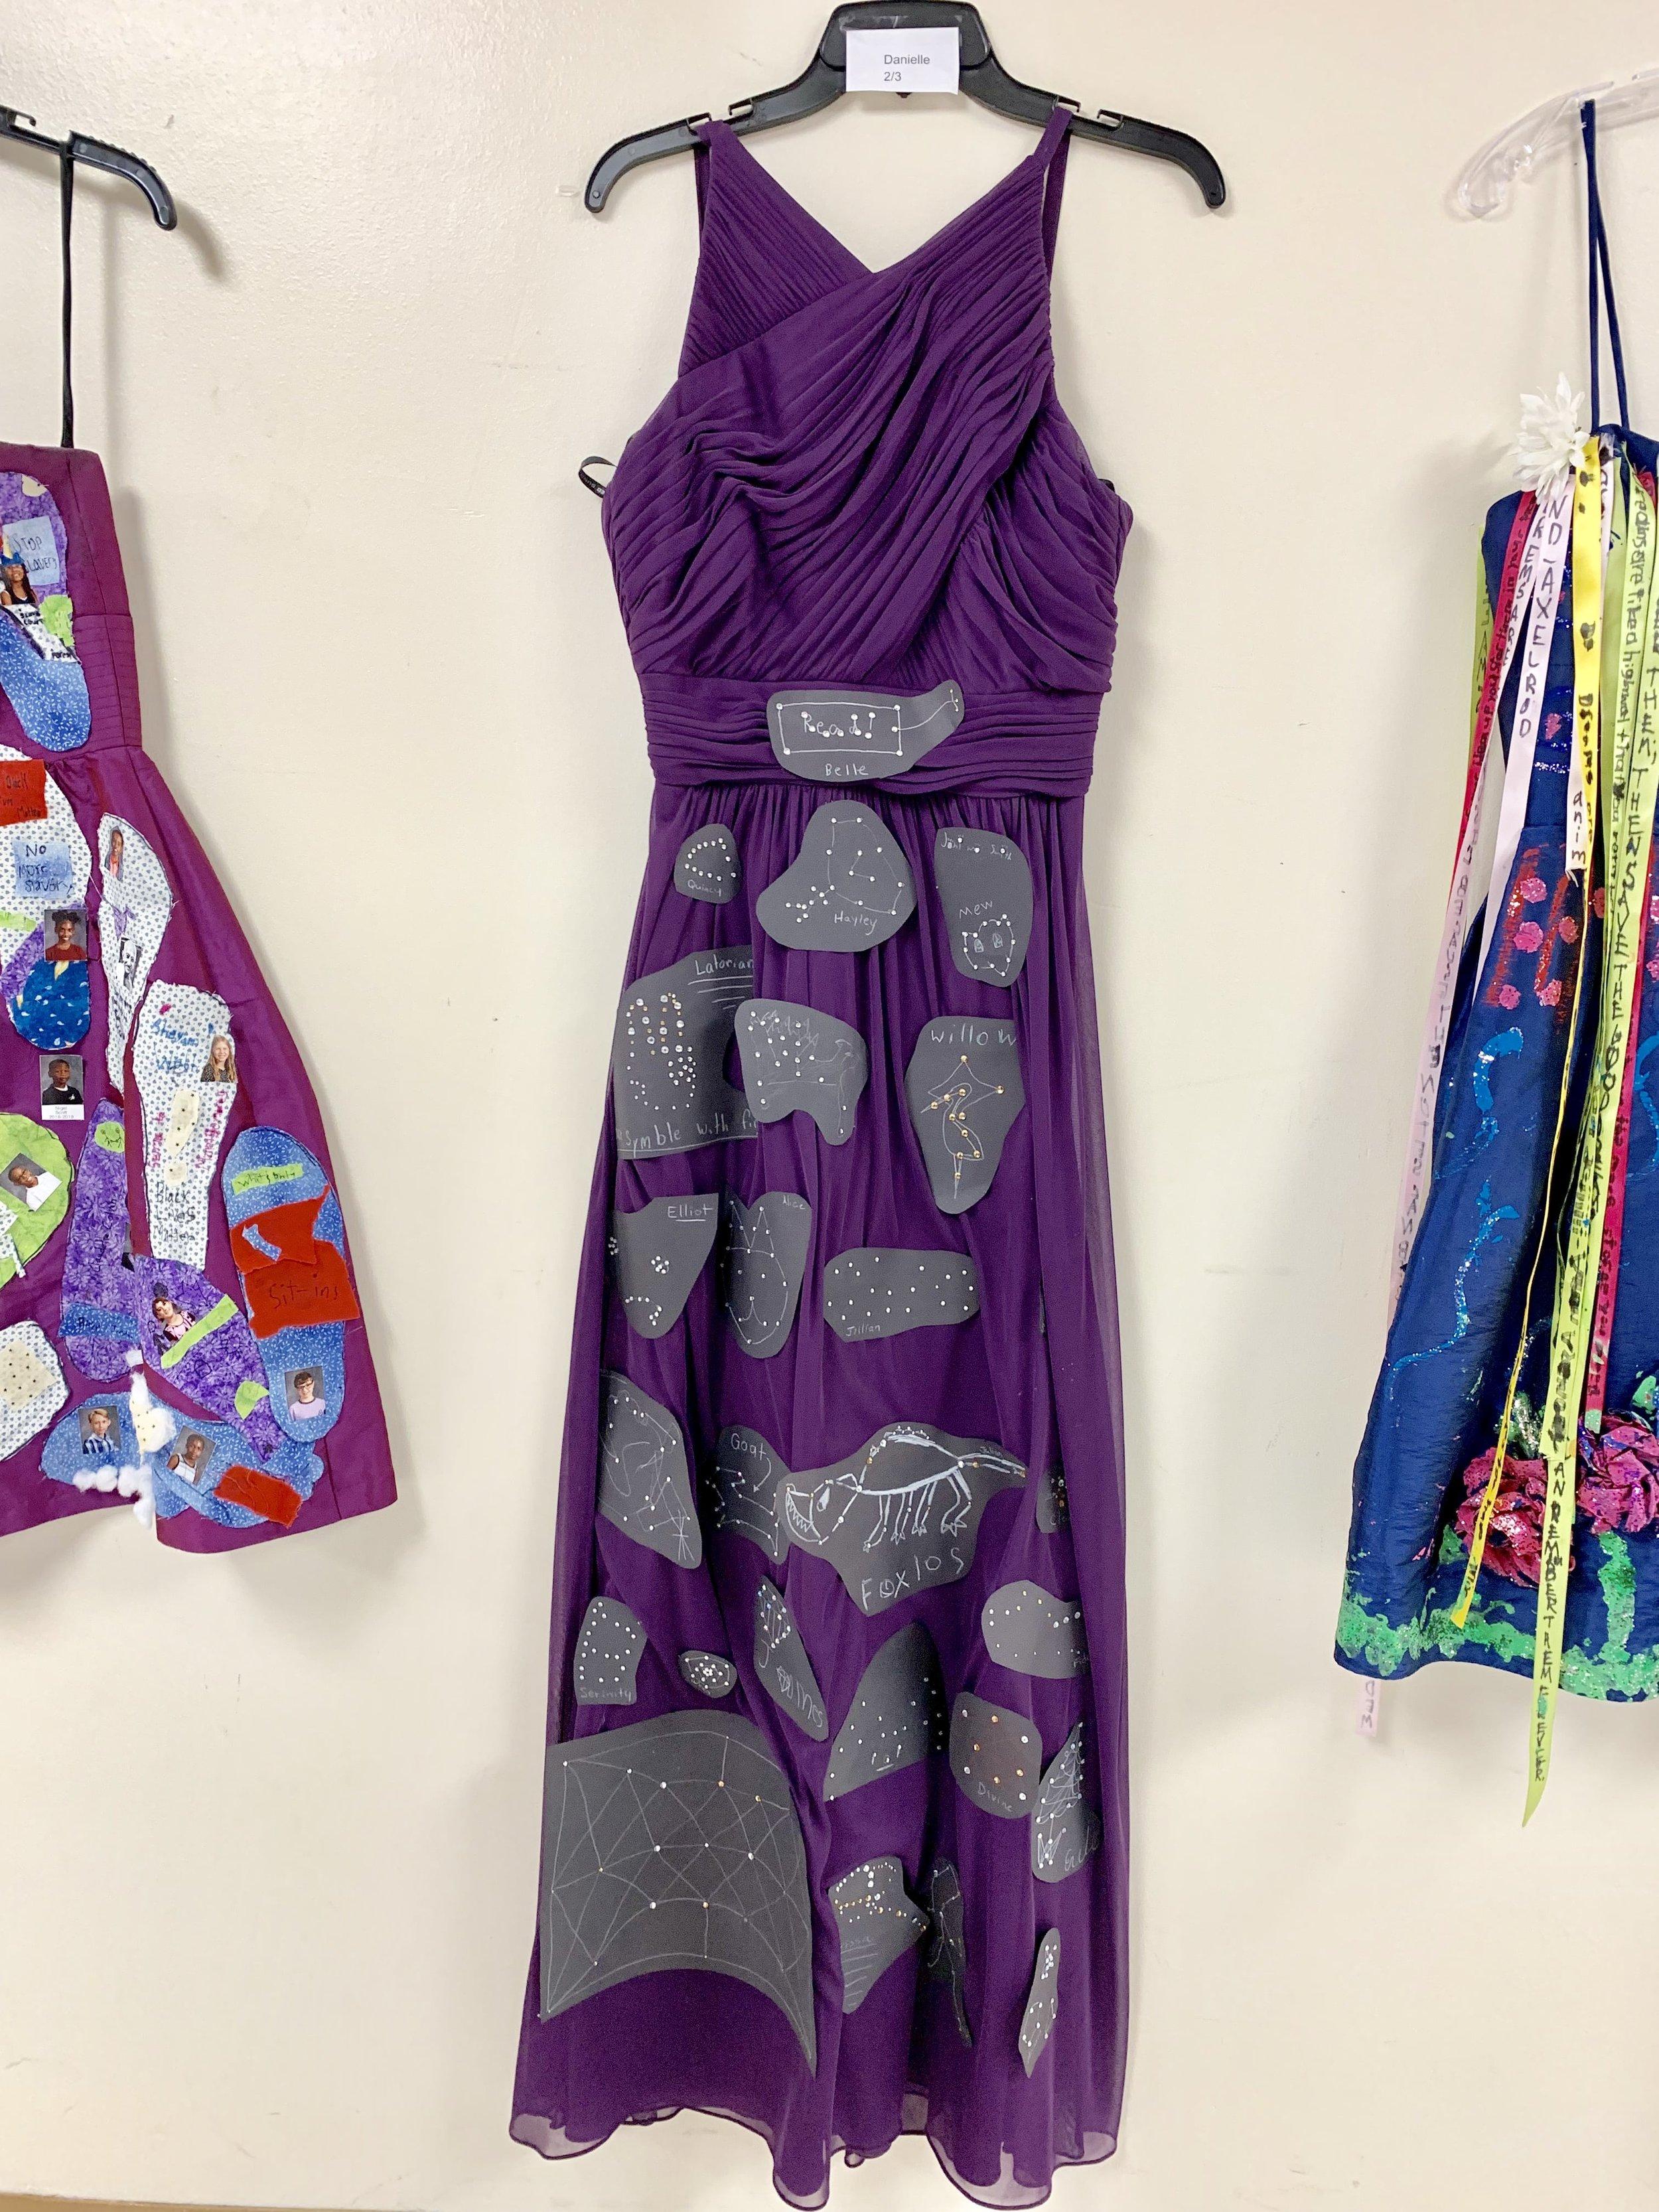 Columbus Ohio dress shop donates dresses for art education for elementary schoolers